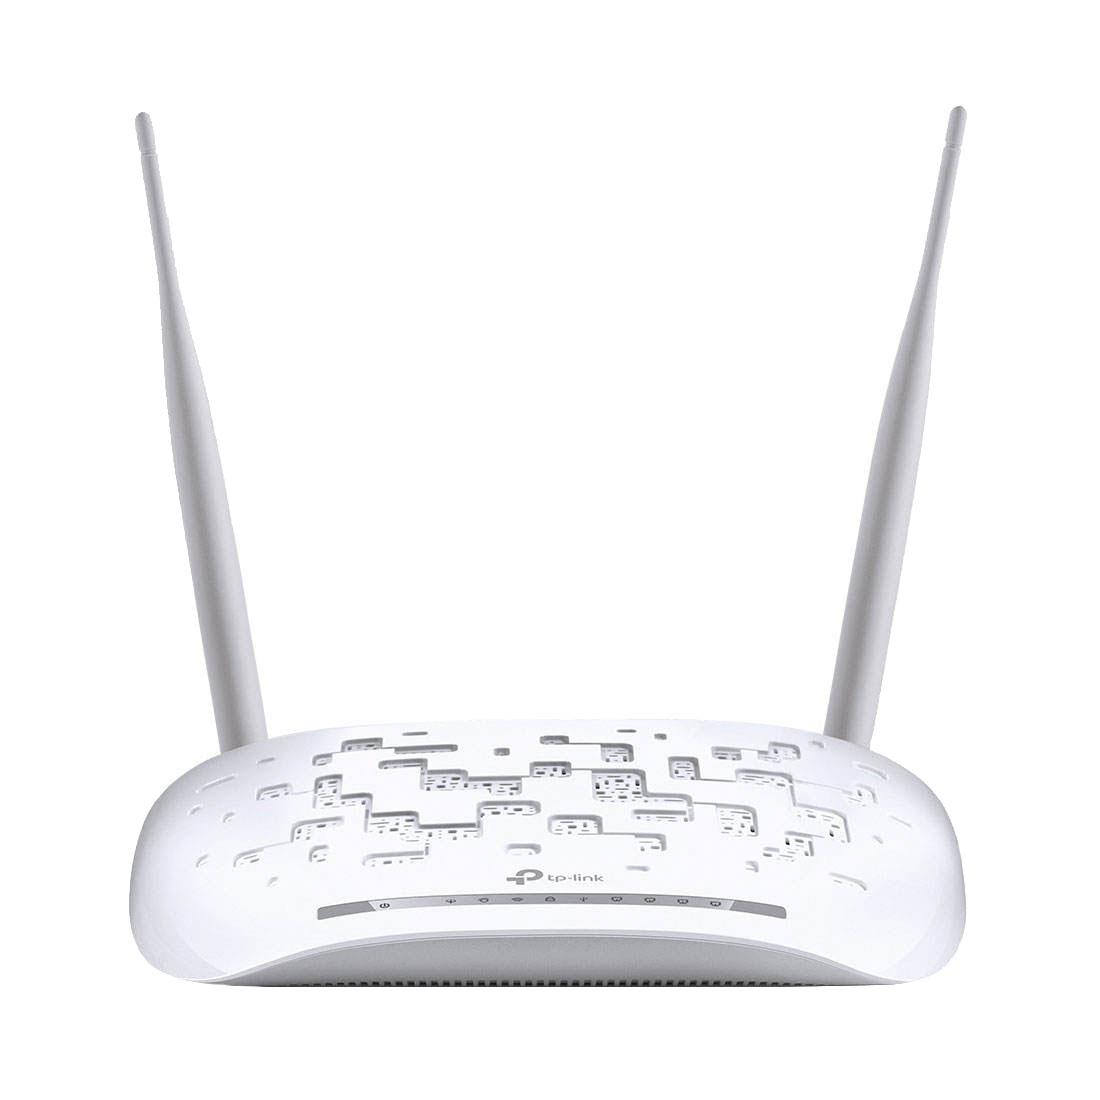 مودم روتر VDSL/ADSL تی پی-لینک مدل TD-W9970